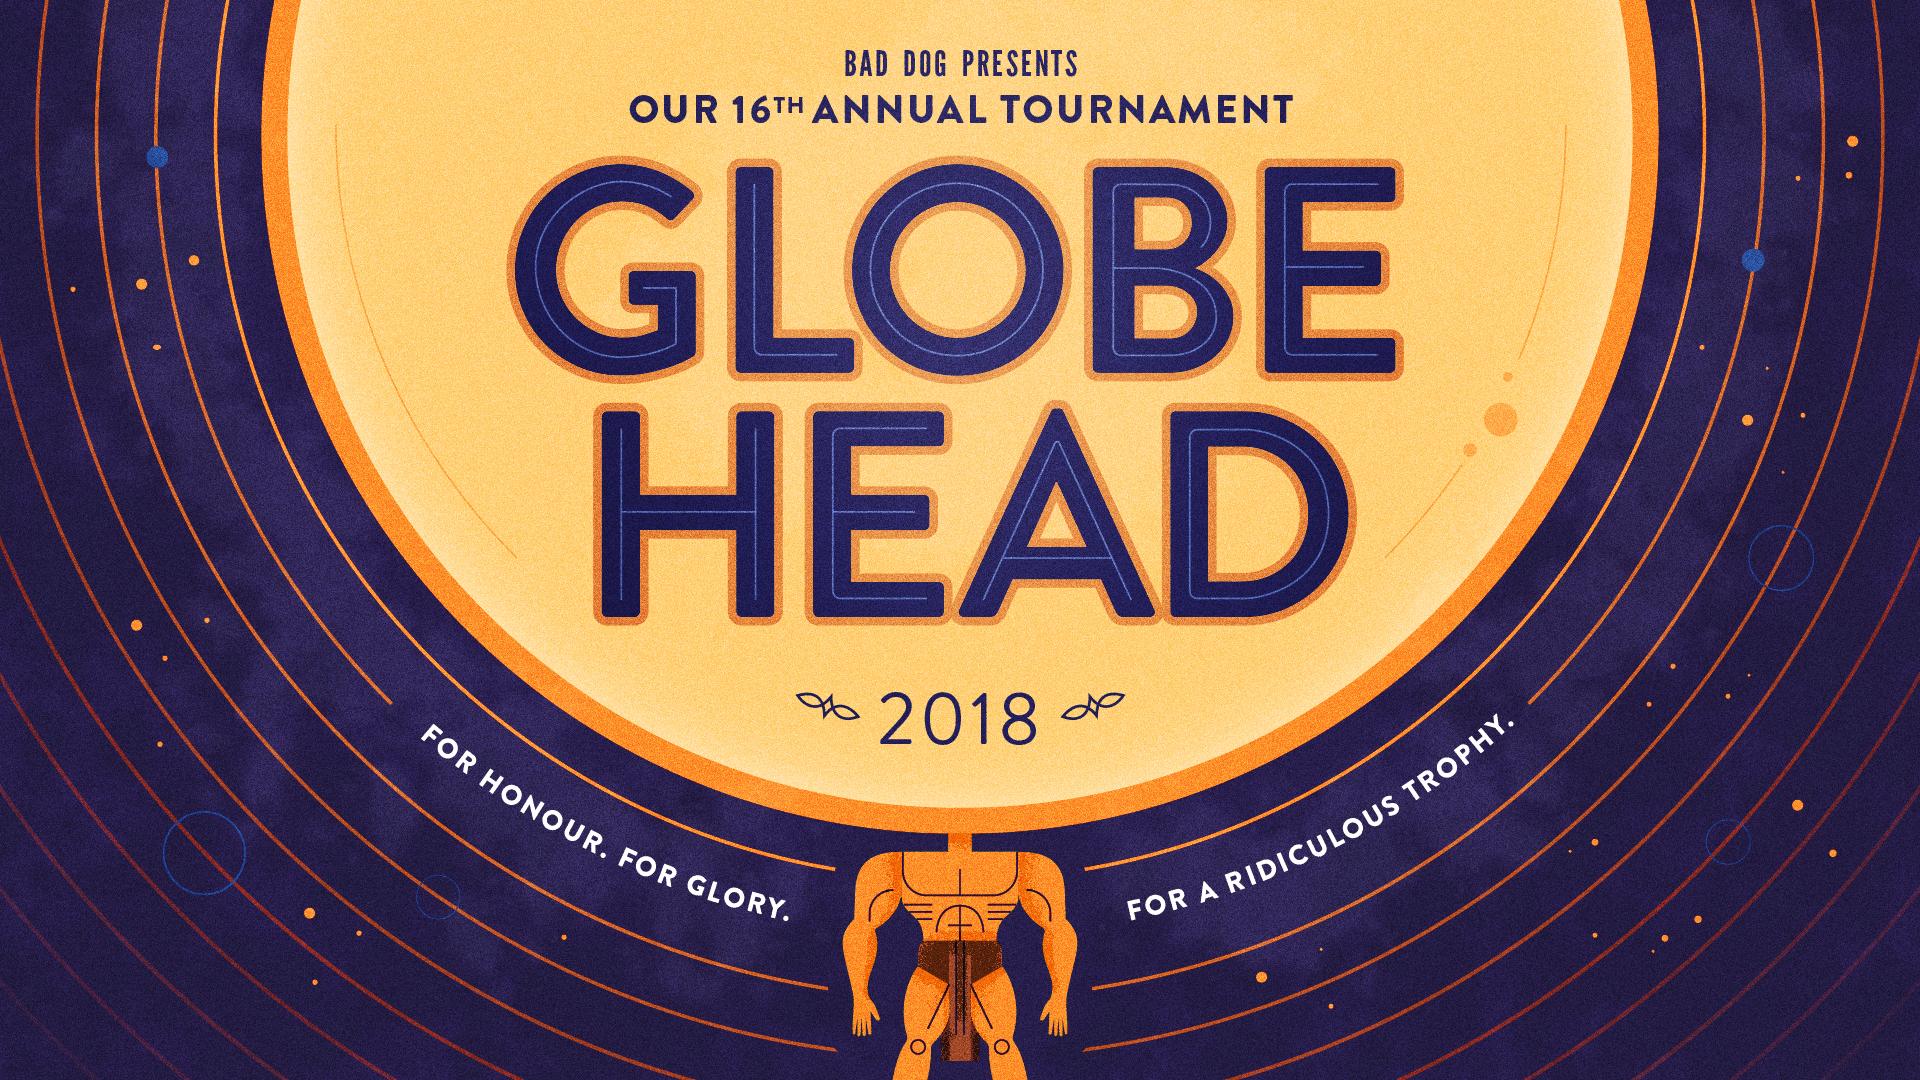 Globehead_facebook_image (1).png